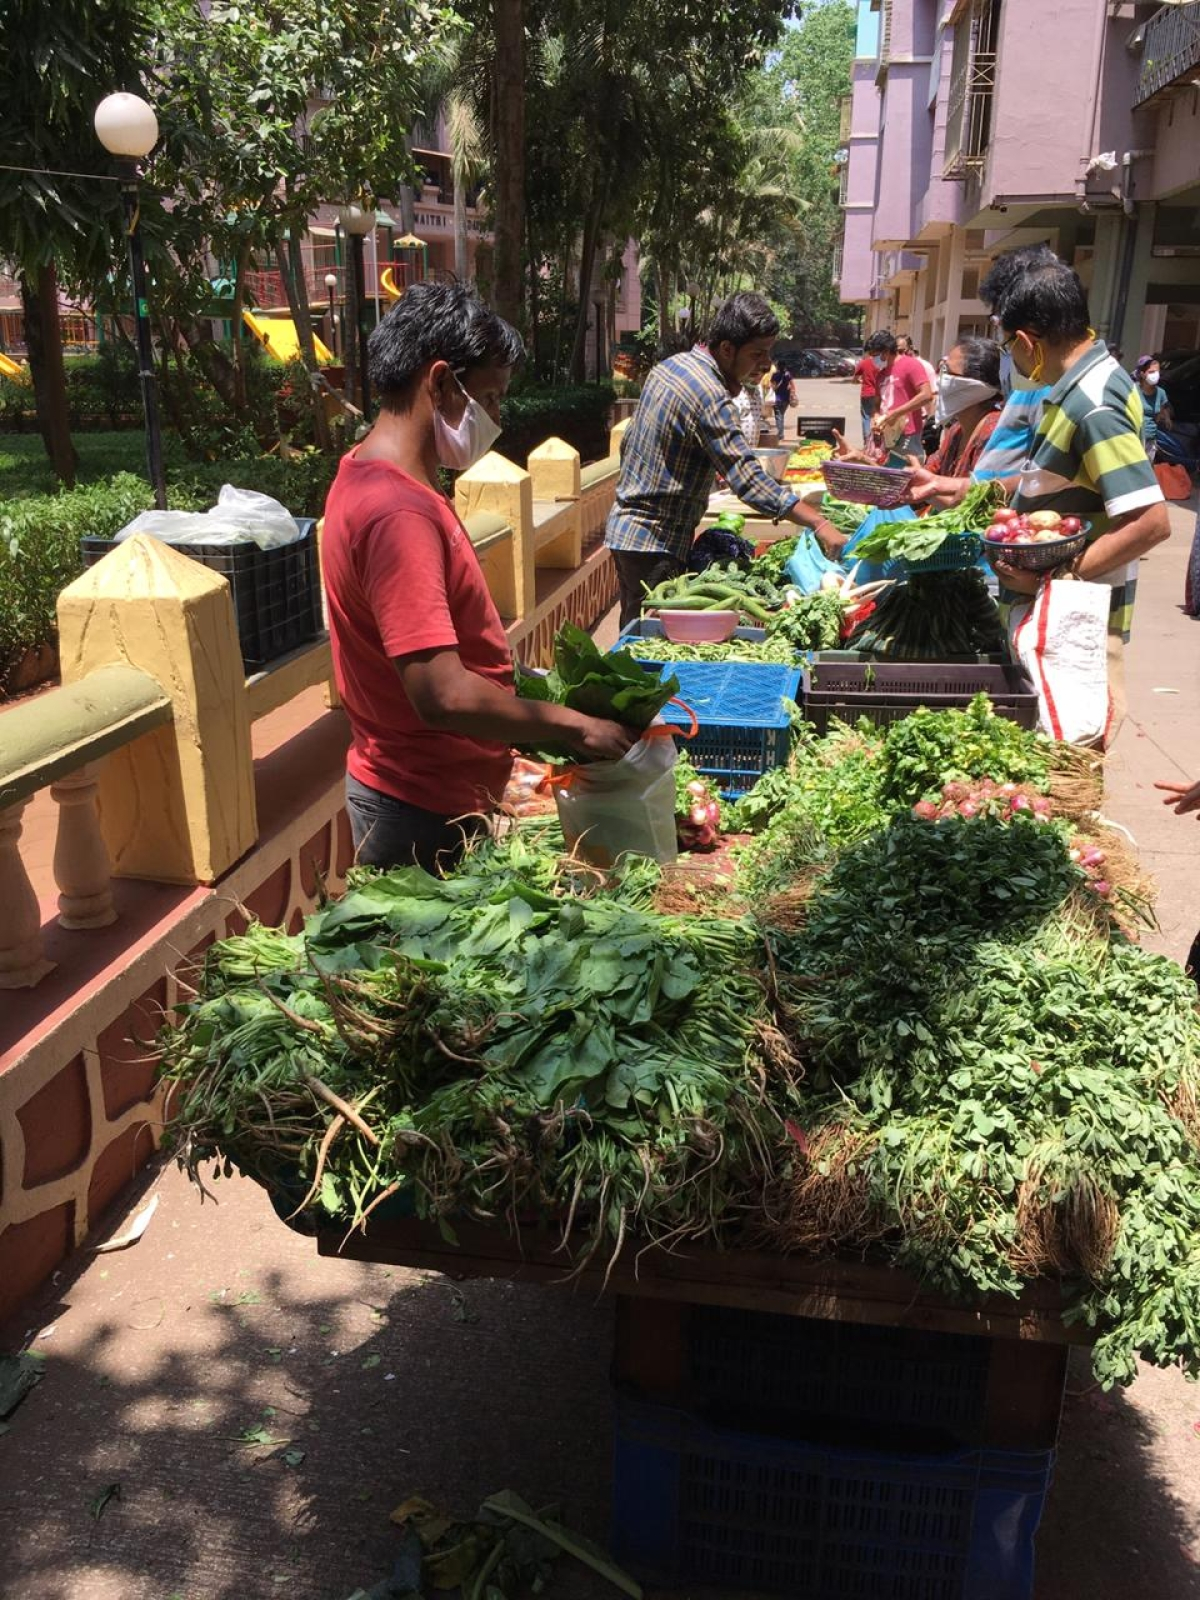 In pics: Residents practice social distancing as societies arrange for vegetable vendors